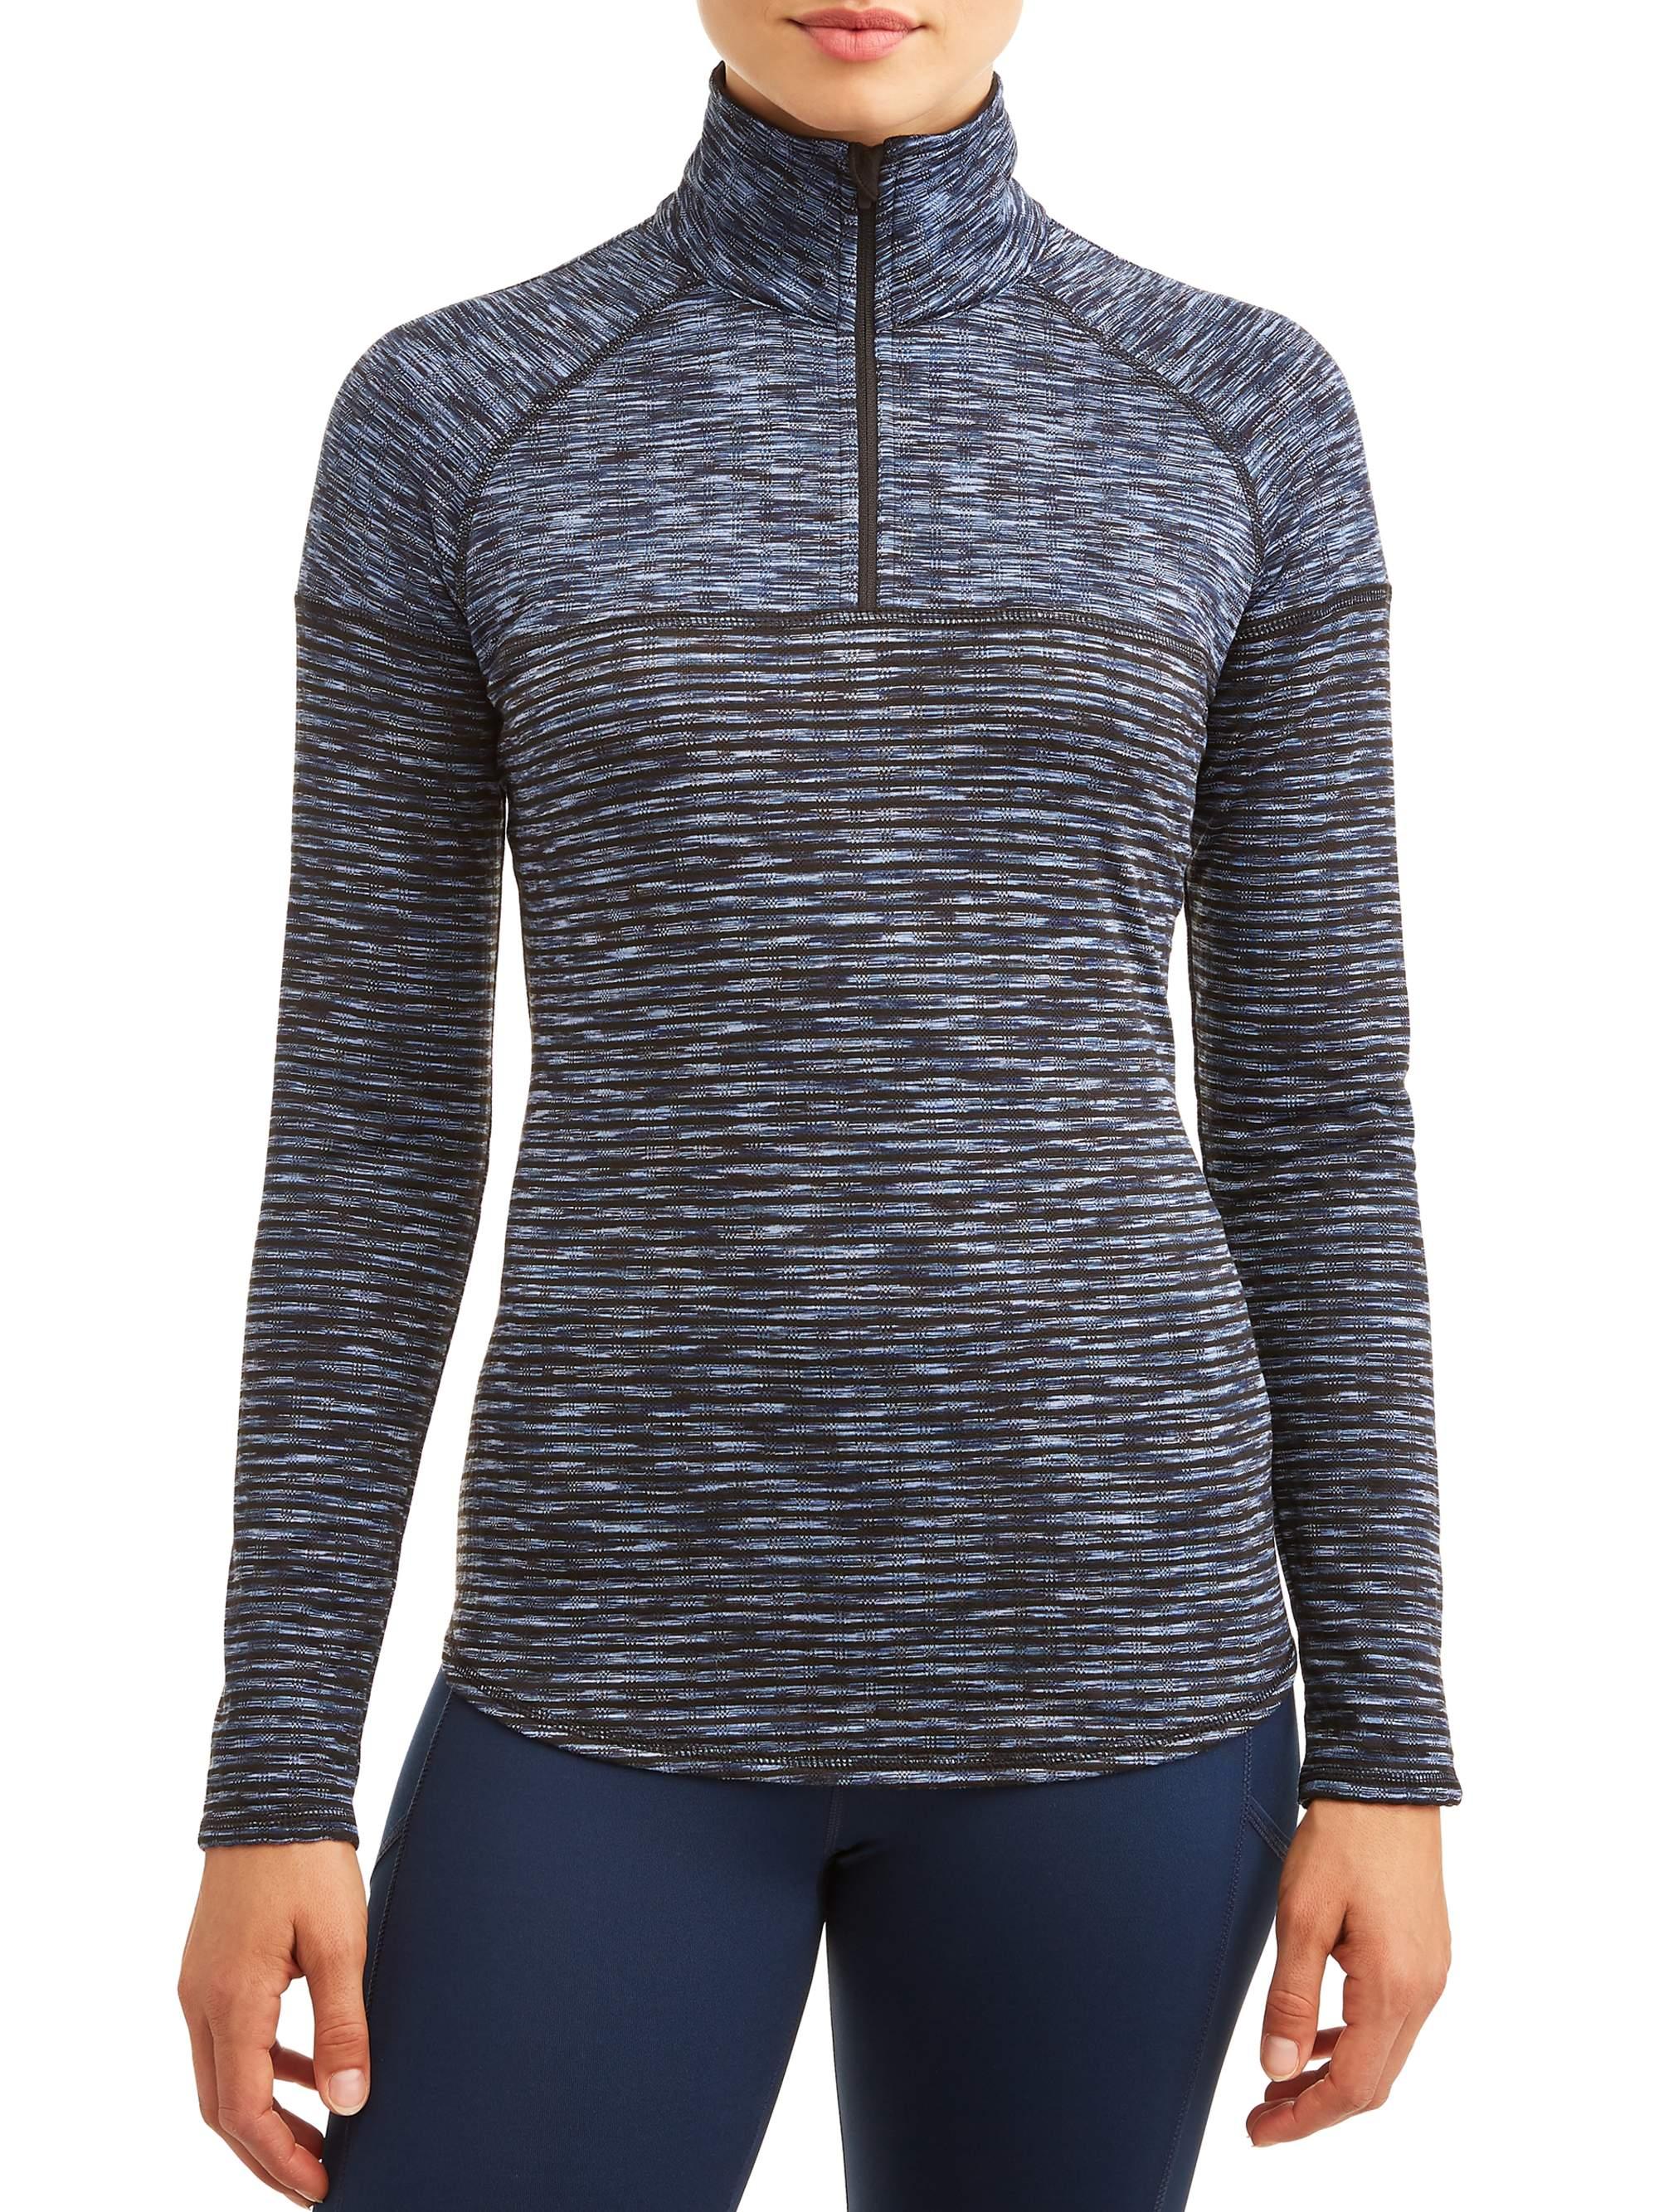 Women's Core Active Perfromance 1/4 Zip Jacket